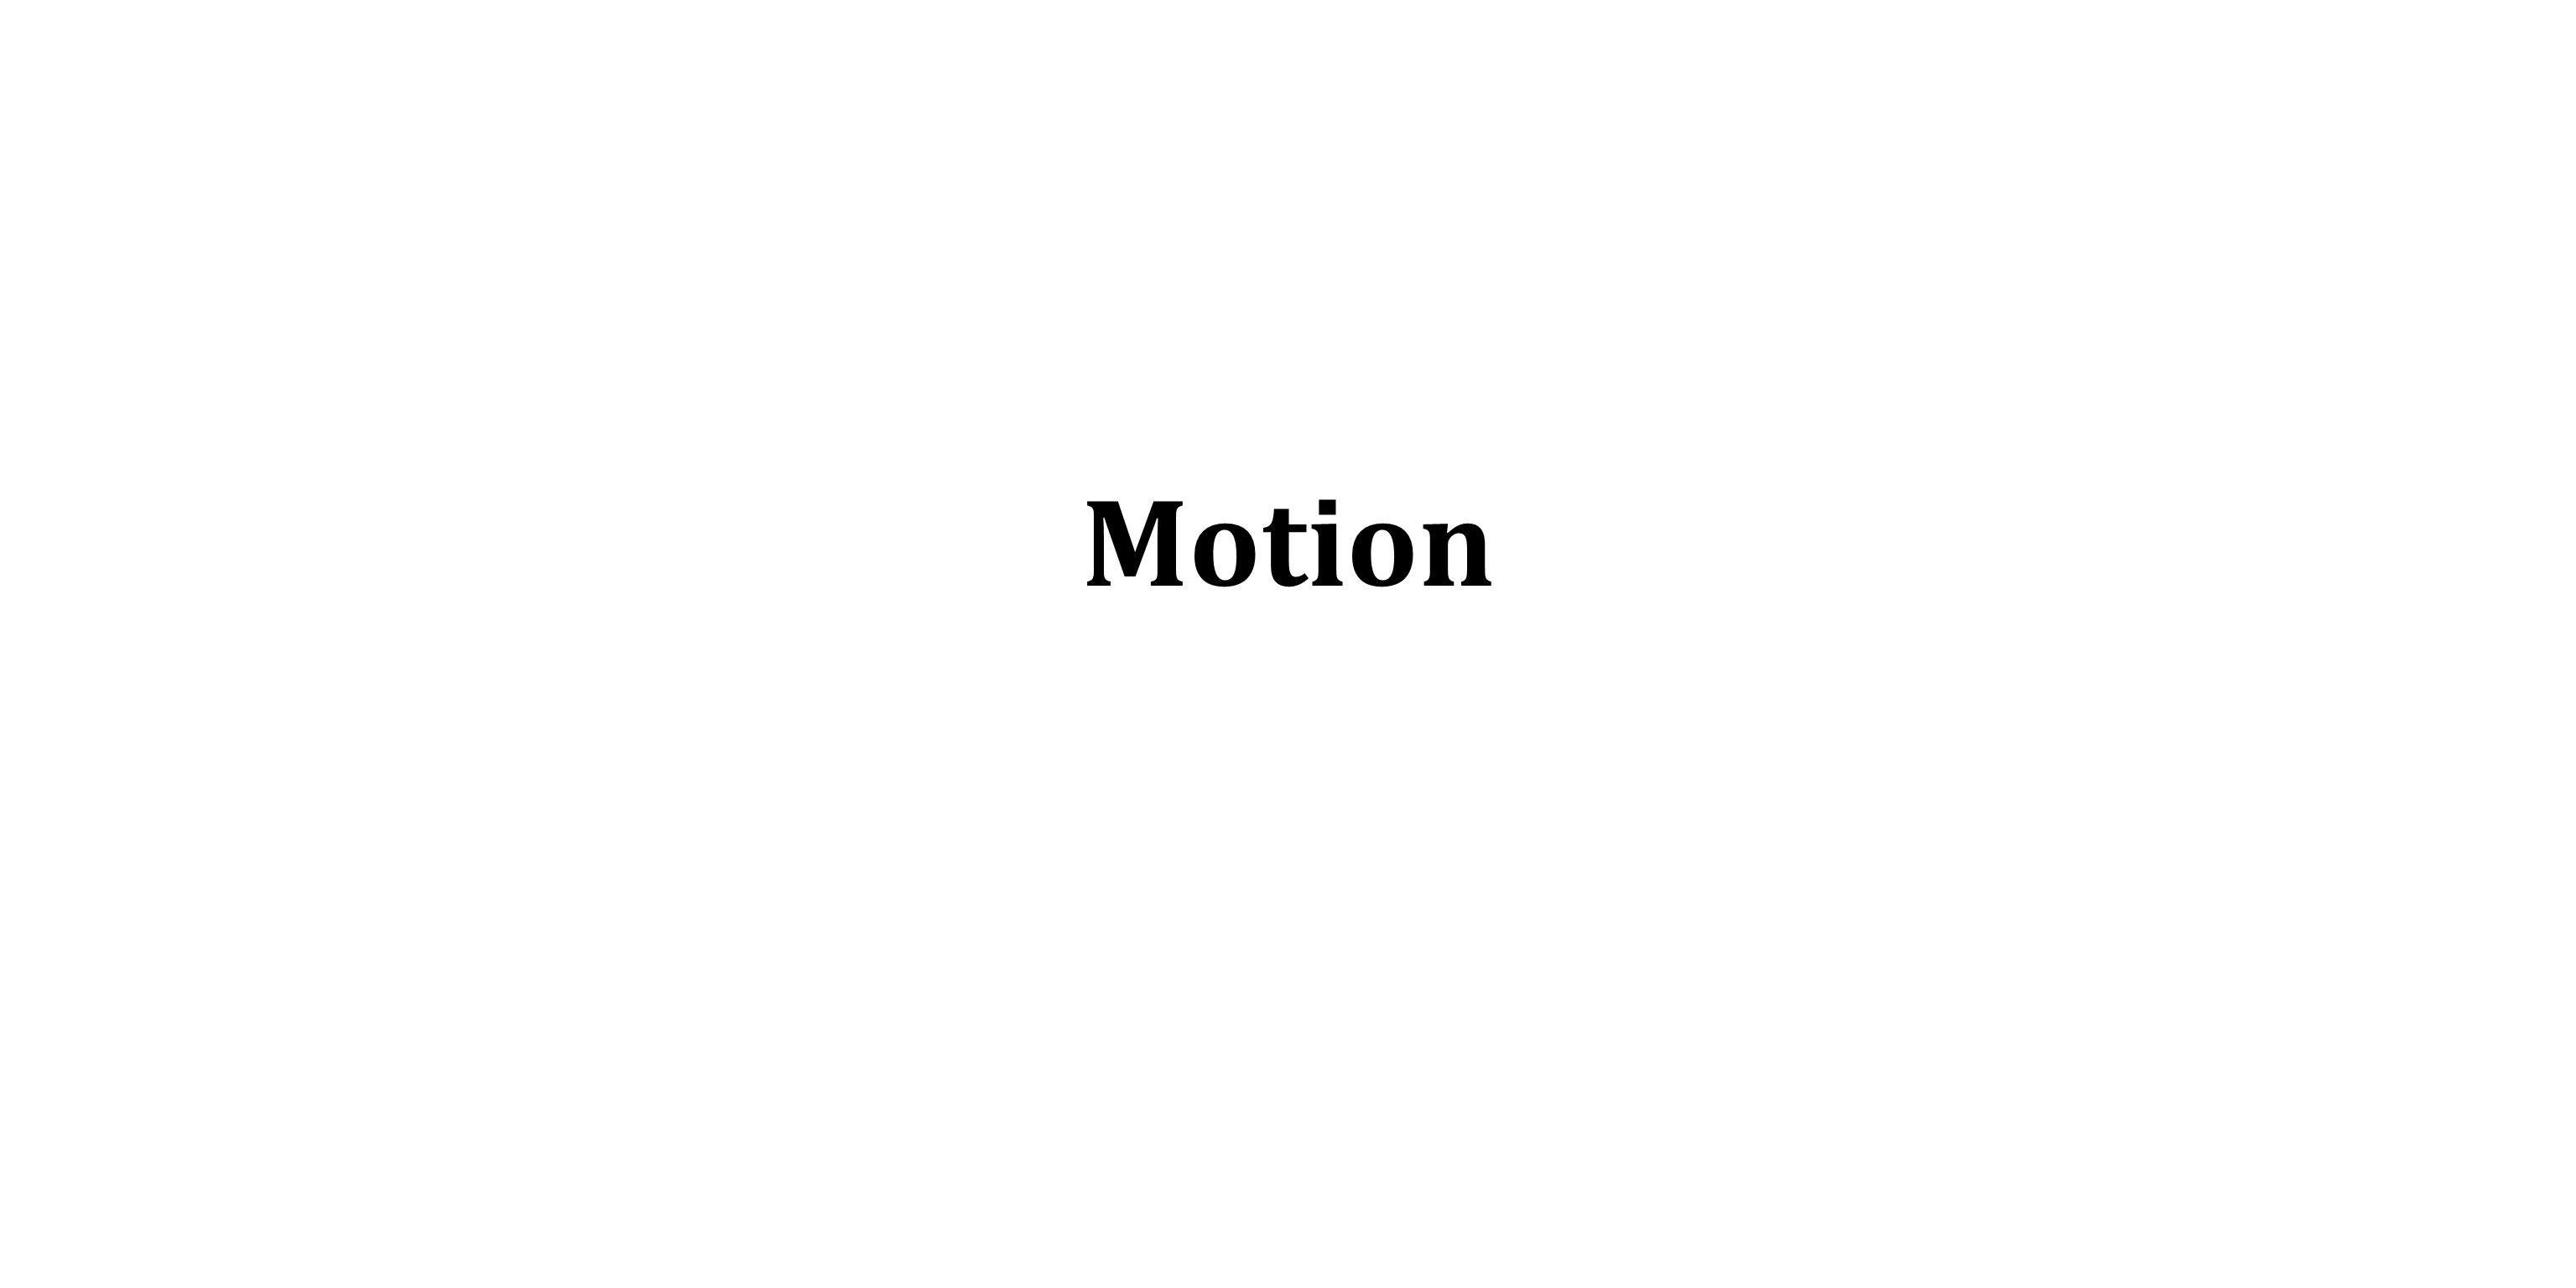 Pengenalan Motion : Pada skrip motion menjelaskan tentang perintah yang berhubungan dengan pergerakan seperti maju, mundur, memutar, pindah posisi, ubah posisi pada scripts scratch.